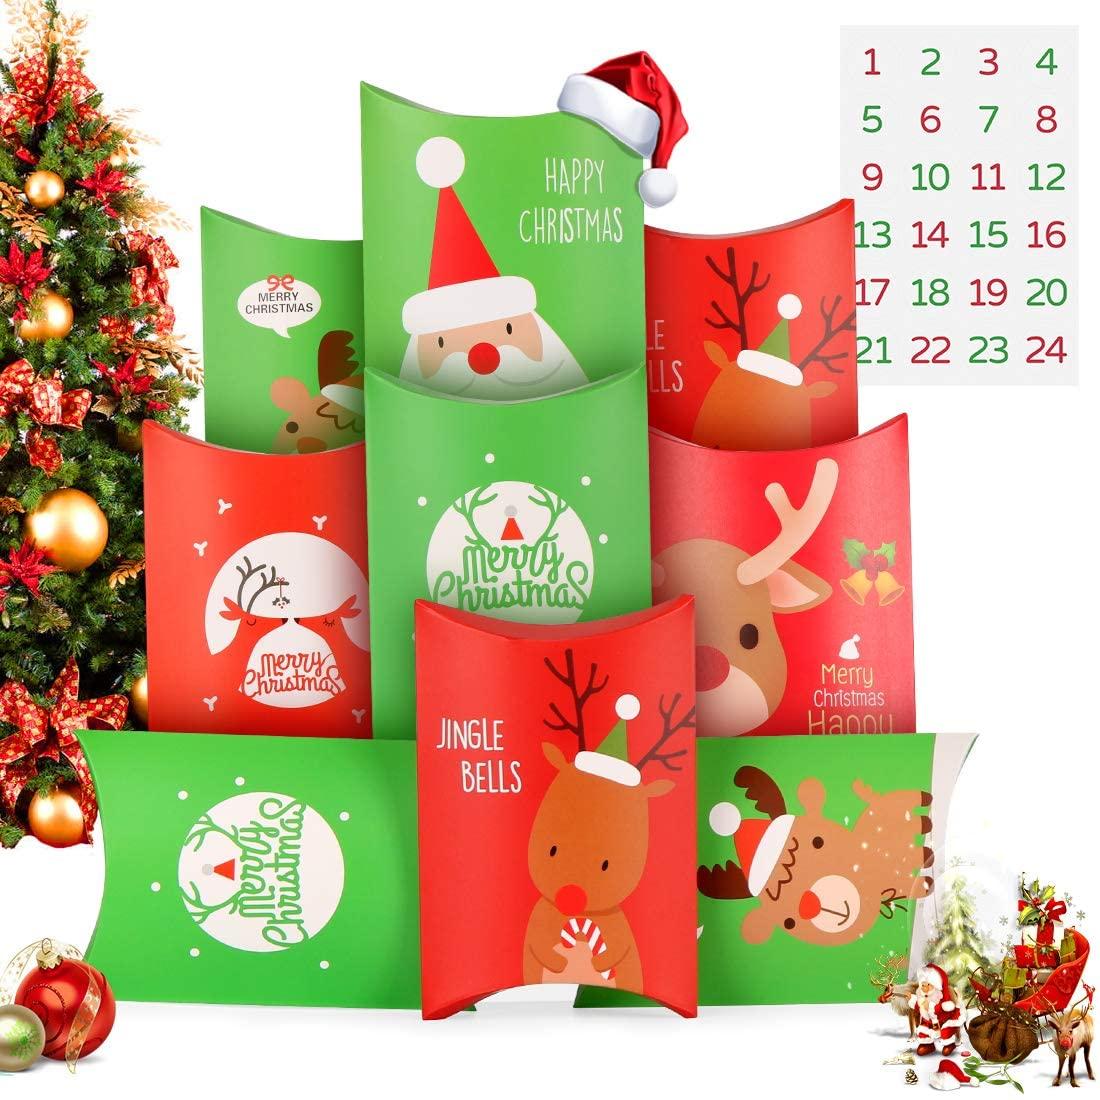 Natale 2021 Calendario.Buon Natale Calendario Dell Avvento 3 Parte Francy S Art